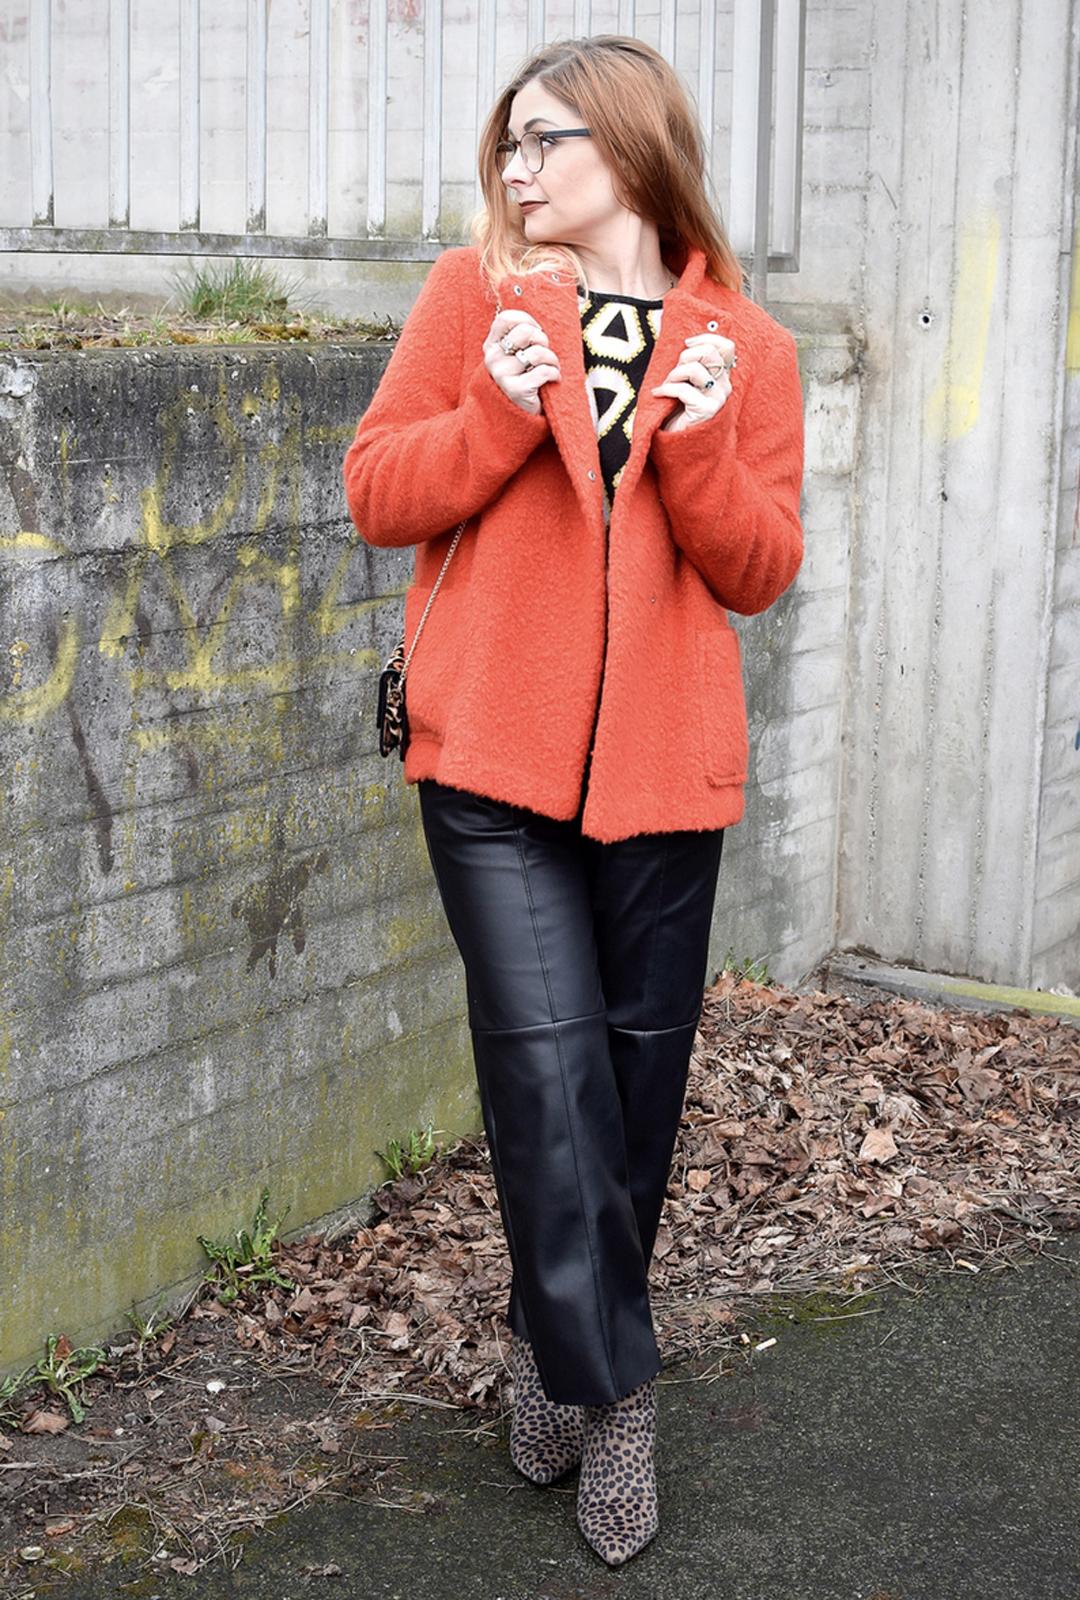 Schwarze Lederhose, Lederhose Frauen, Schwarz und Orange